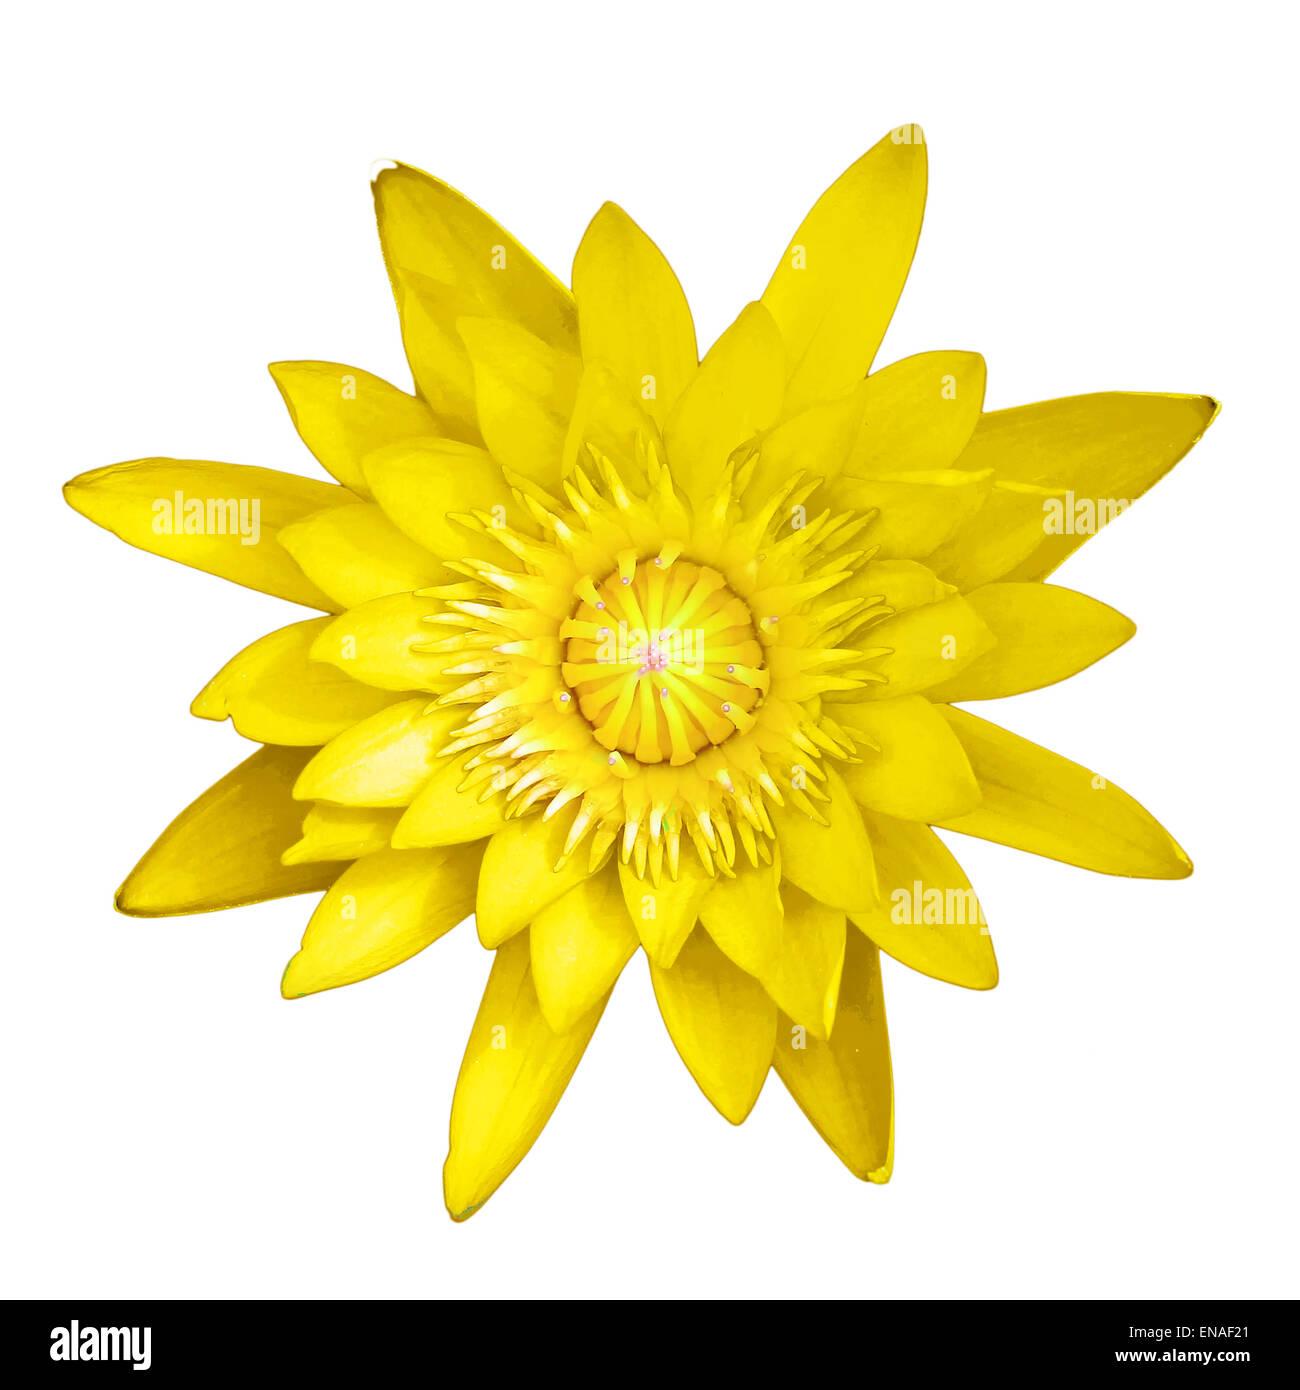 Yellow lotus flower isolated on white background stock photo yellow lotus flower isolated on white background izmirmasajfo